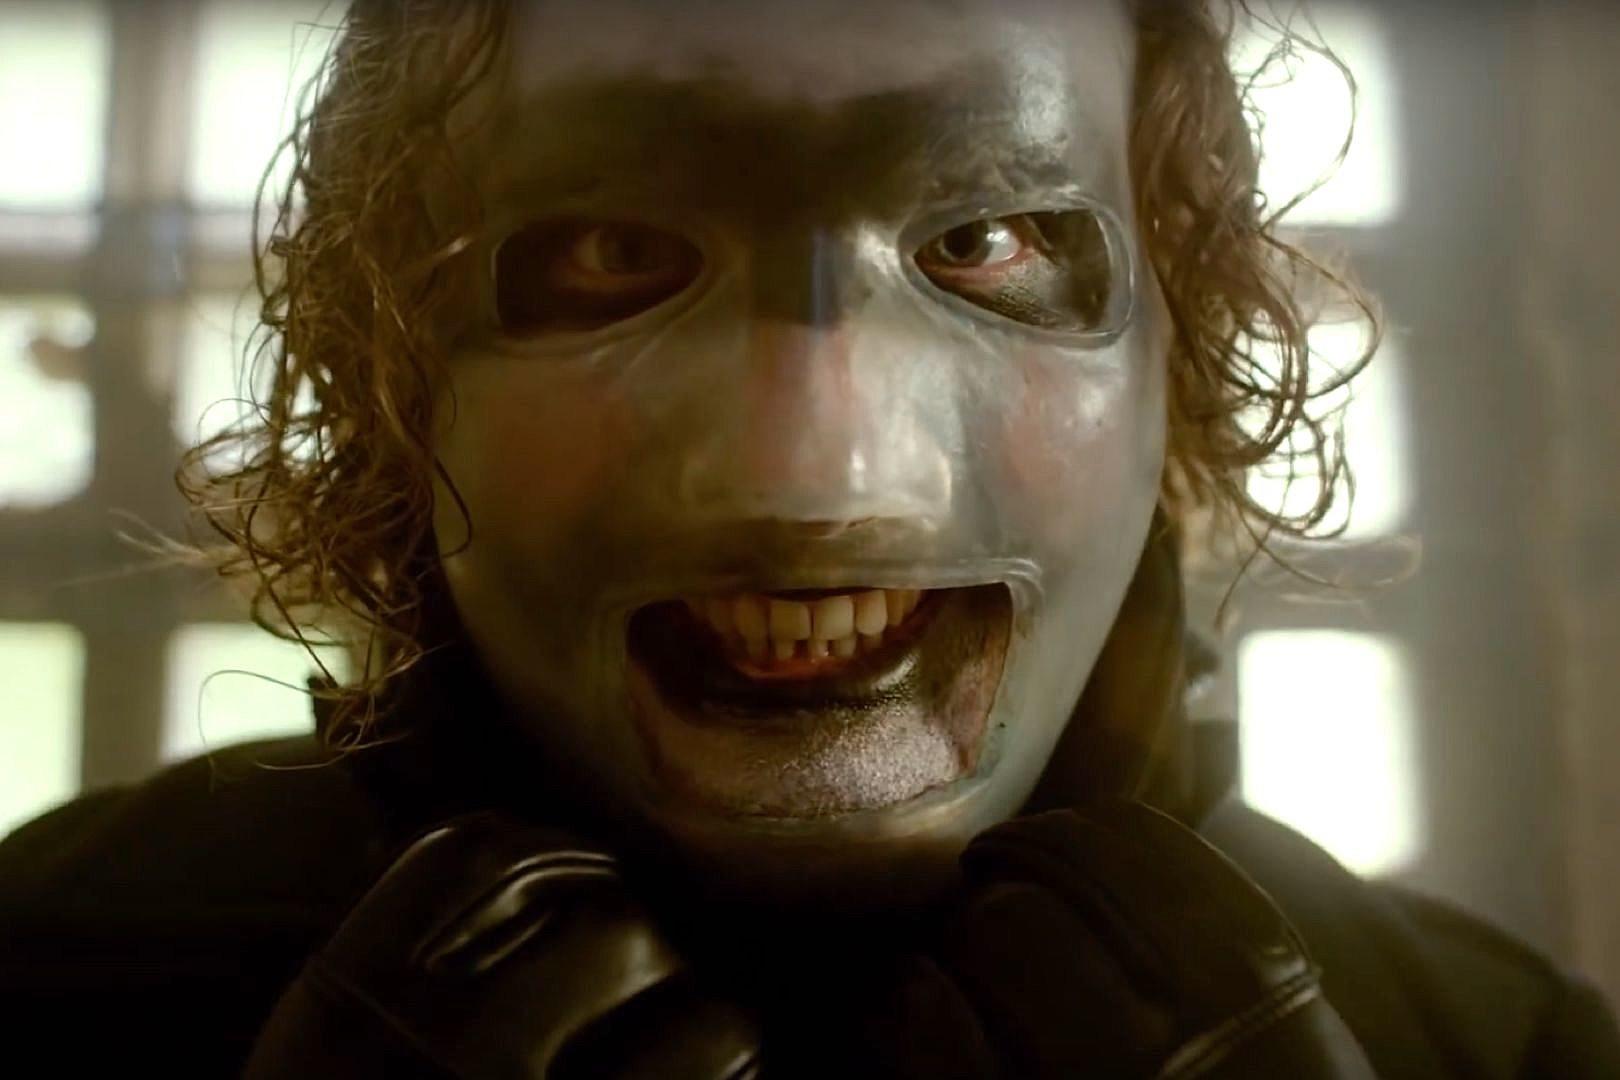 Horror FX Legend Tom Savini Explains Creating Corey Taylor's New Slipknot Mask